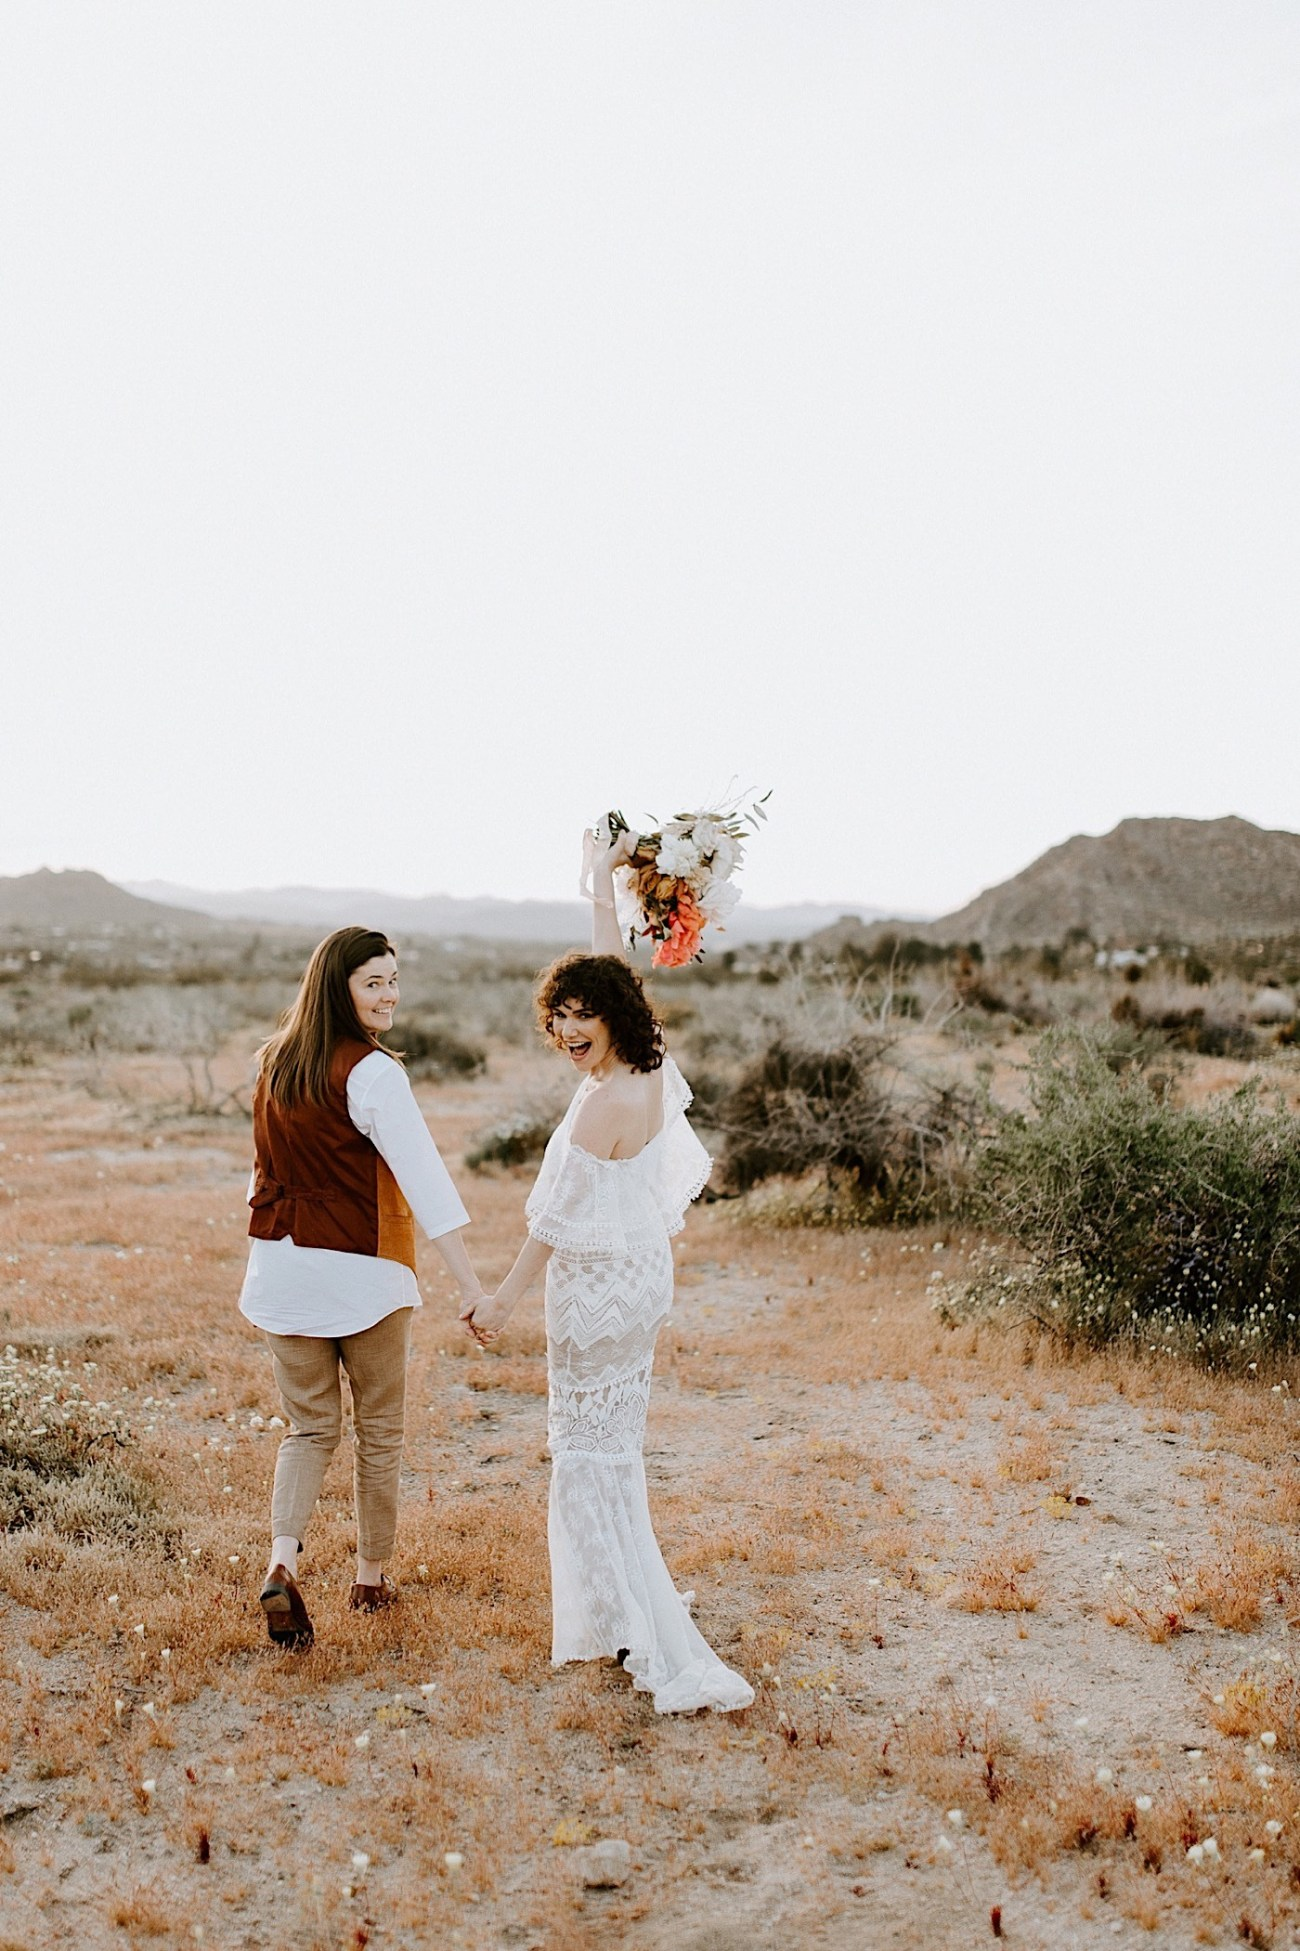 Joshua Tree Same Sex Wedding Joshua Tree Wedding Photographer Palm Springs Wedding Photographer 36